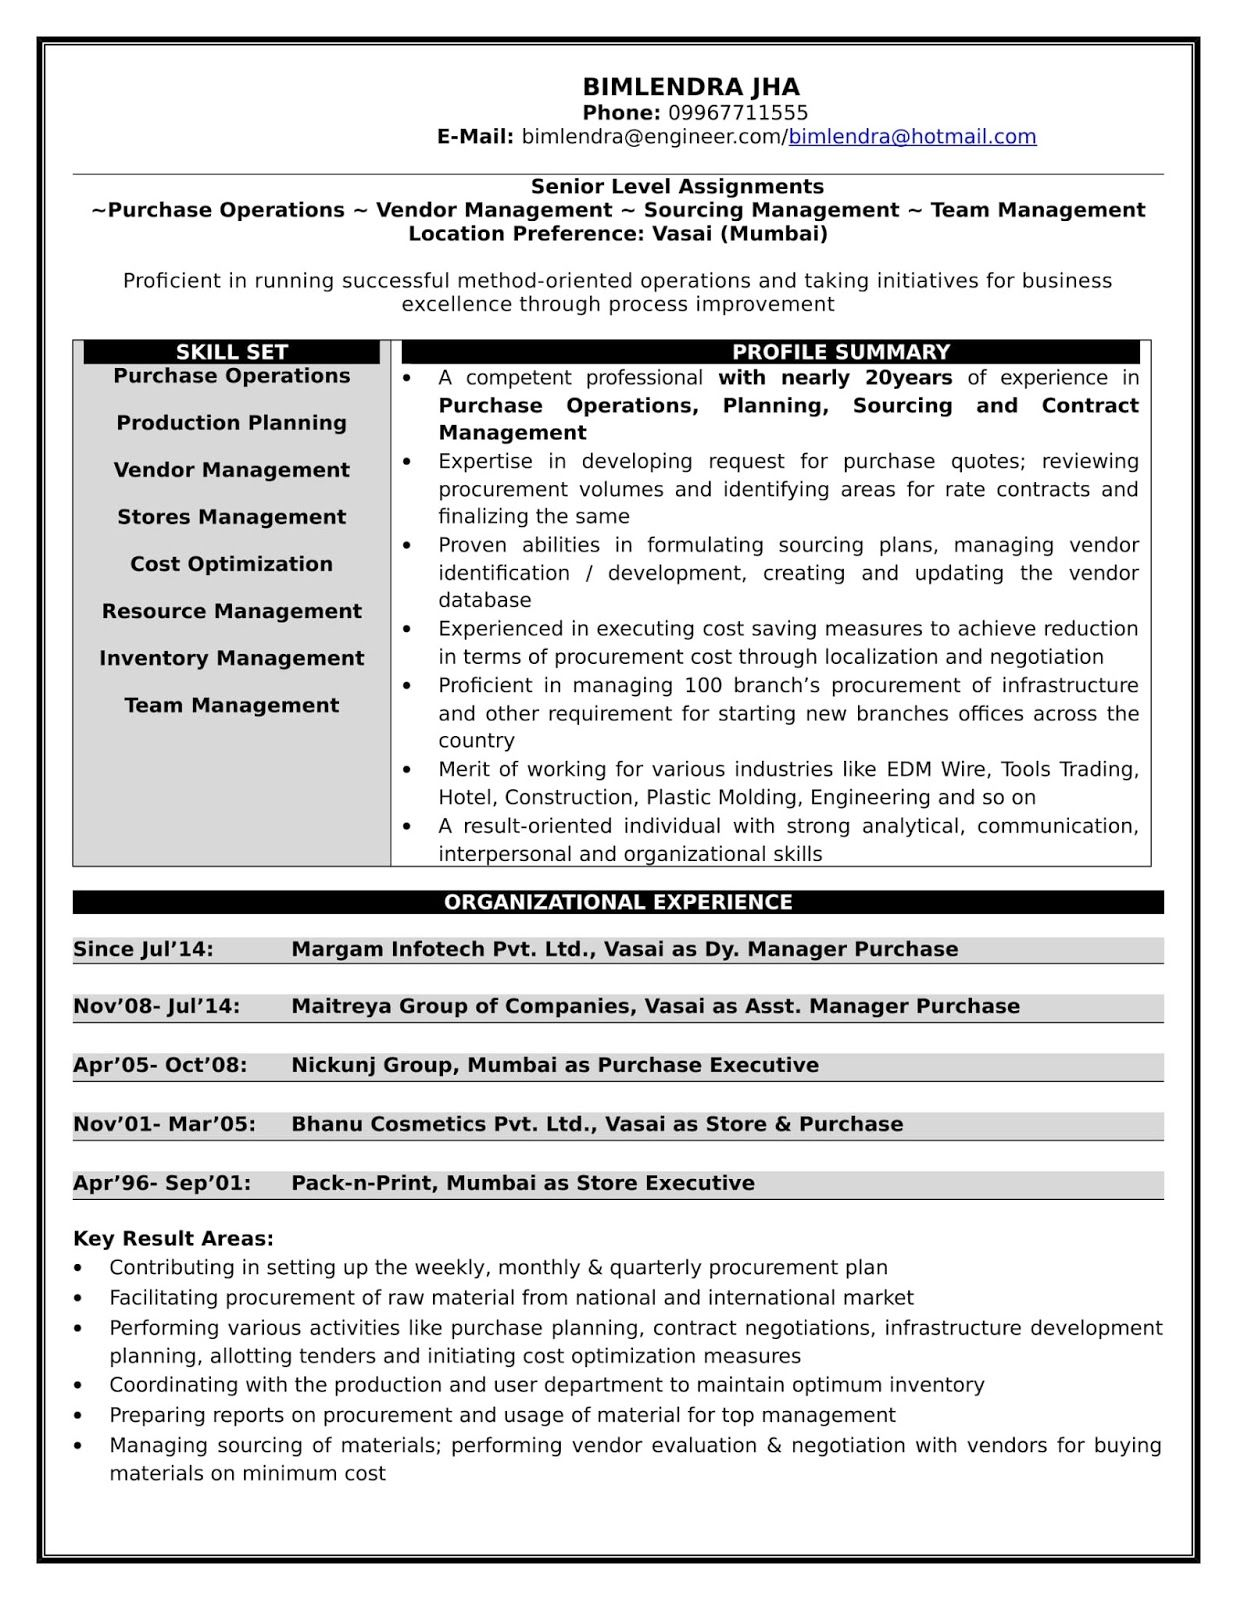 Bimlendra Jha Resume For Purchase Management Management Purchase Manager Resume